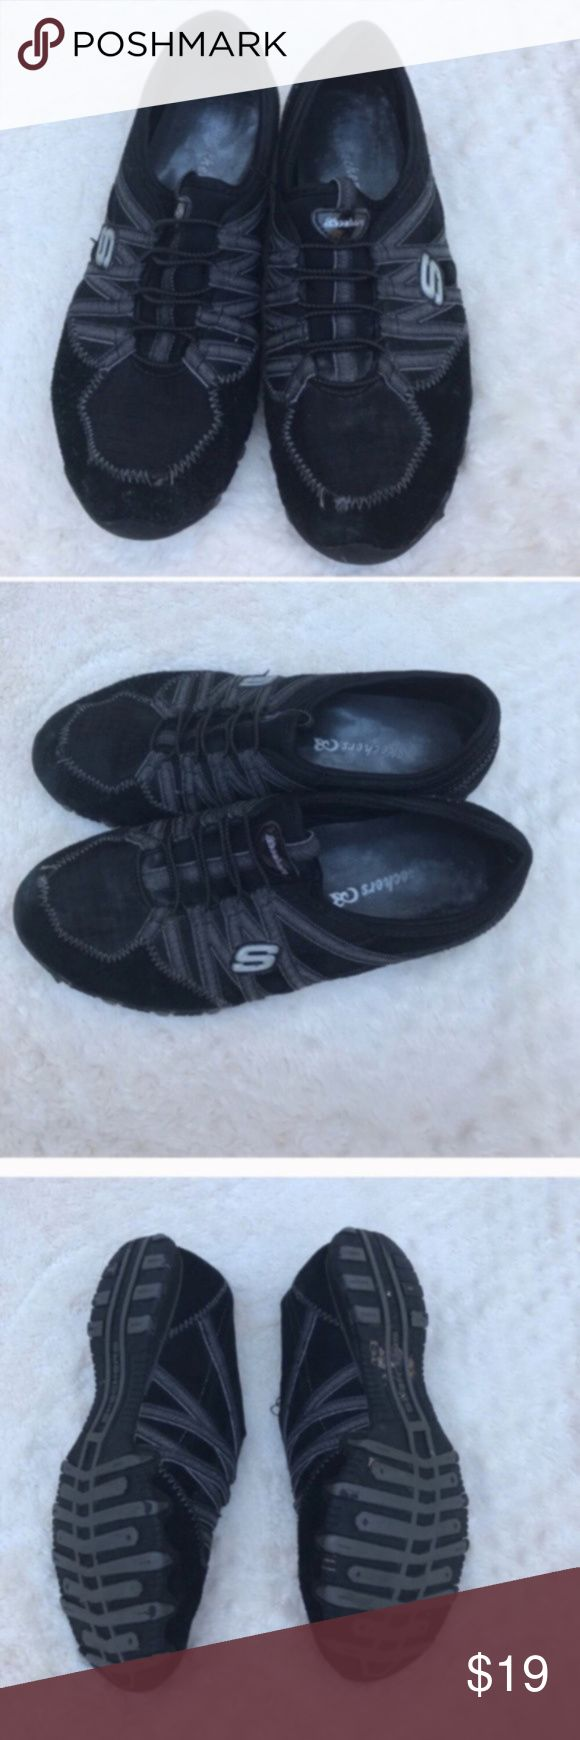 Skechers slip on shoes black size 8 Skechers slip on shoes black size 8 Skechers Shoes Sneakers